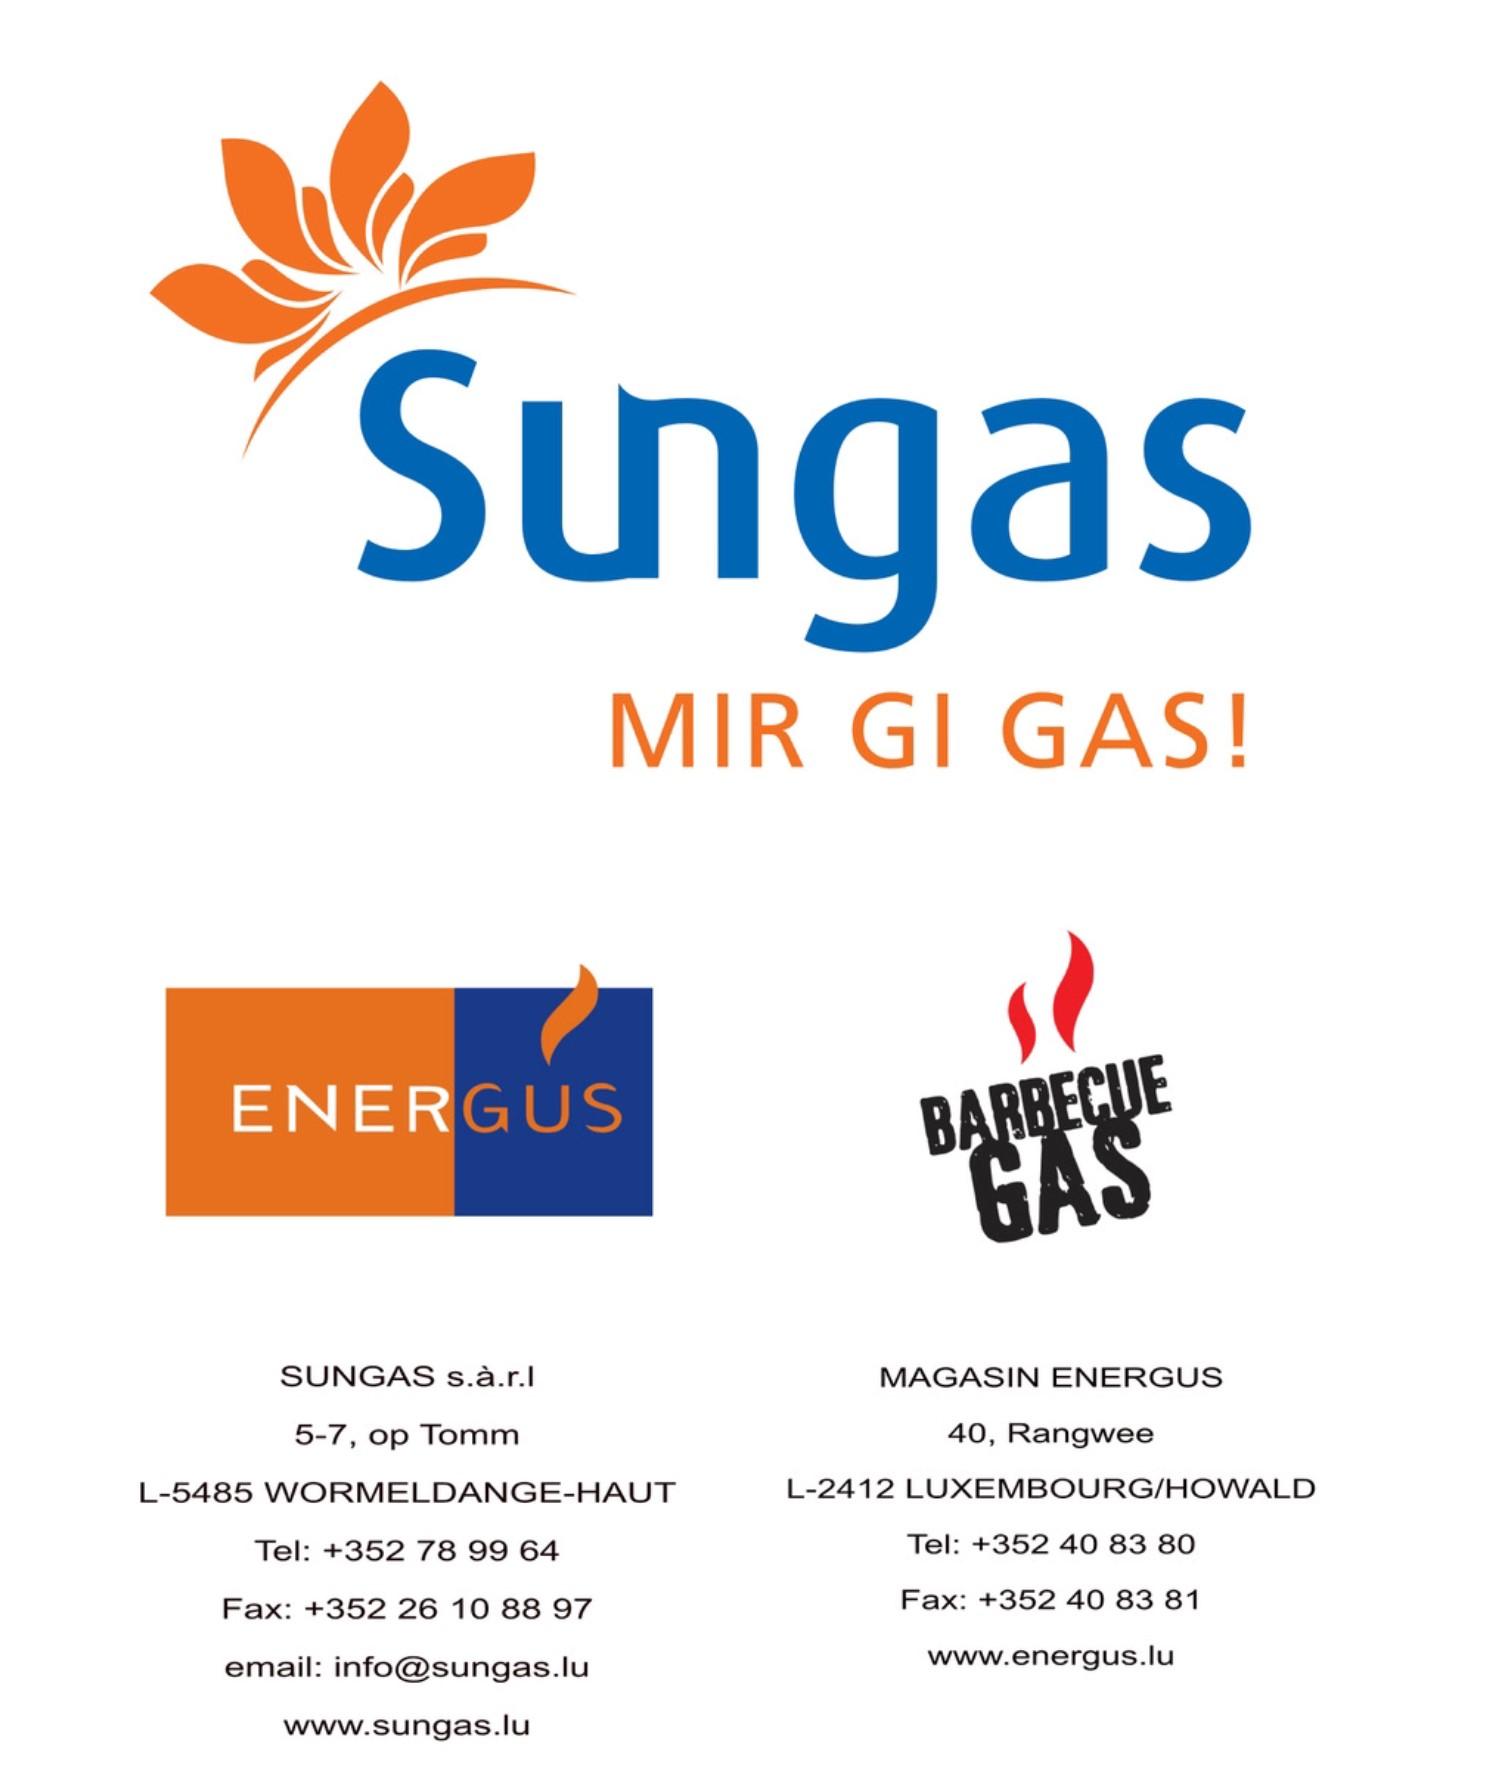 SUNGAS sàrl + Maison ENERGUS